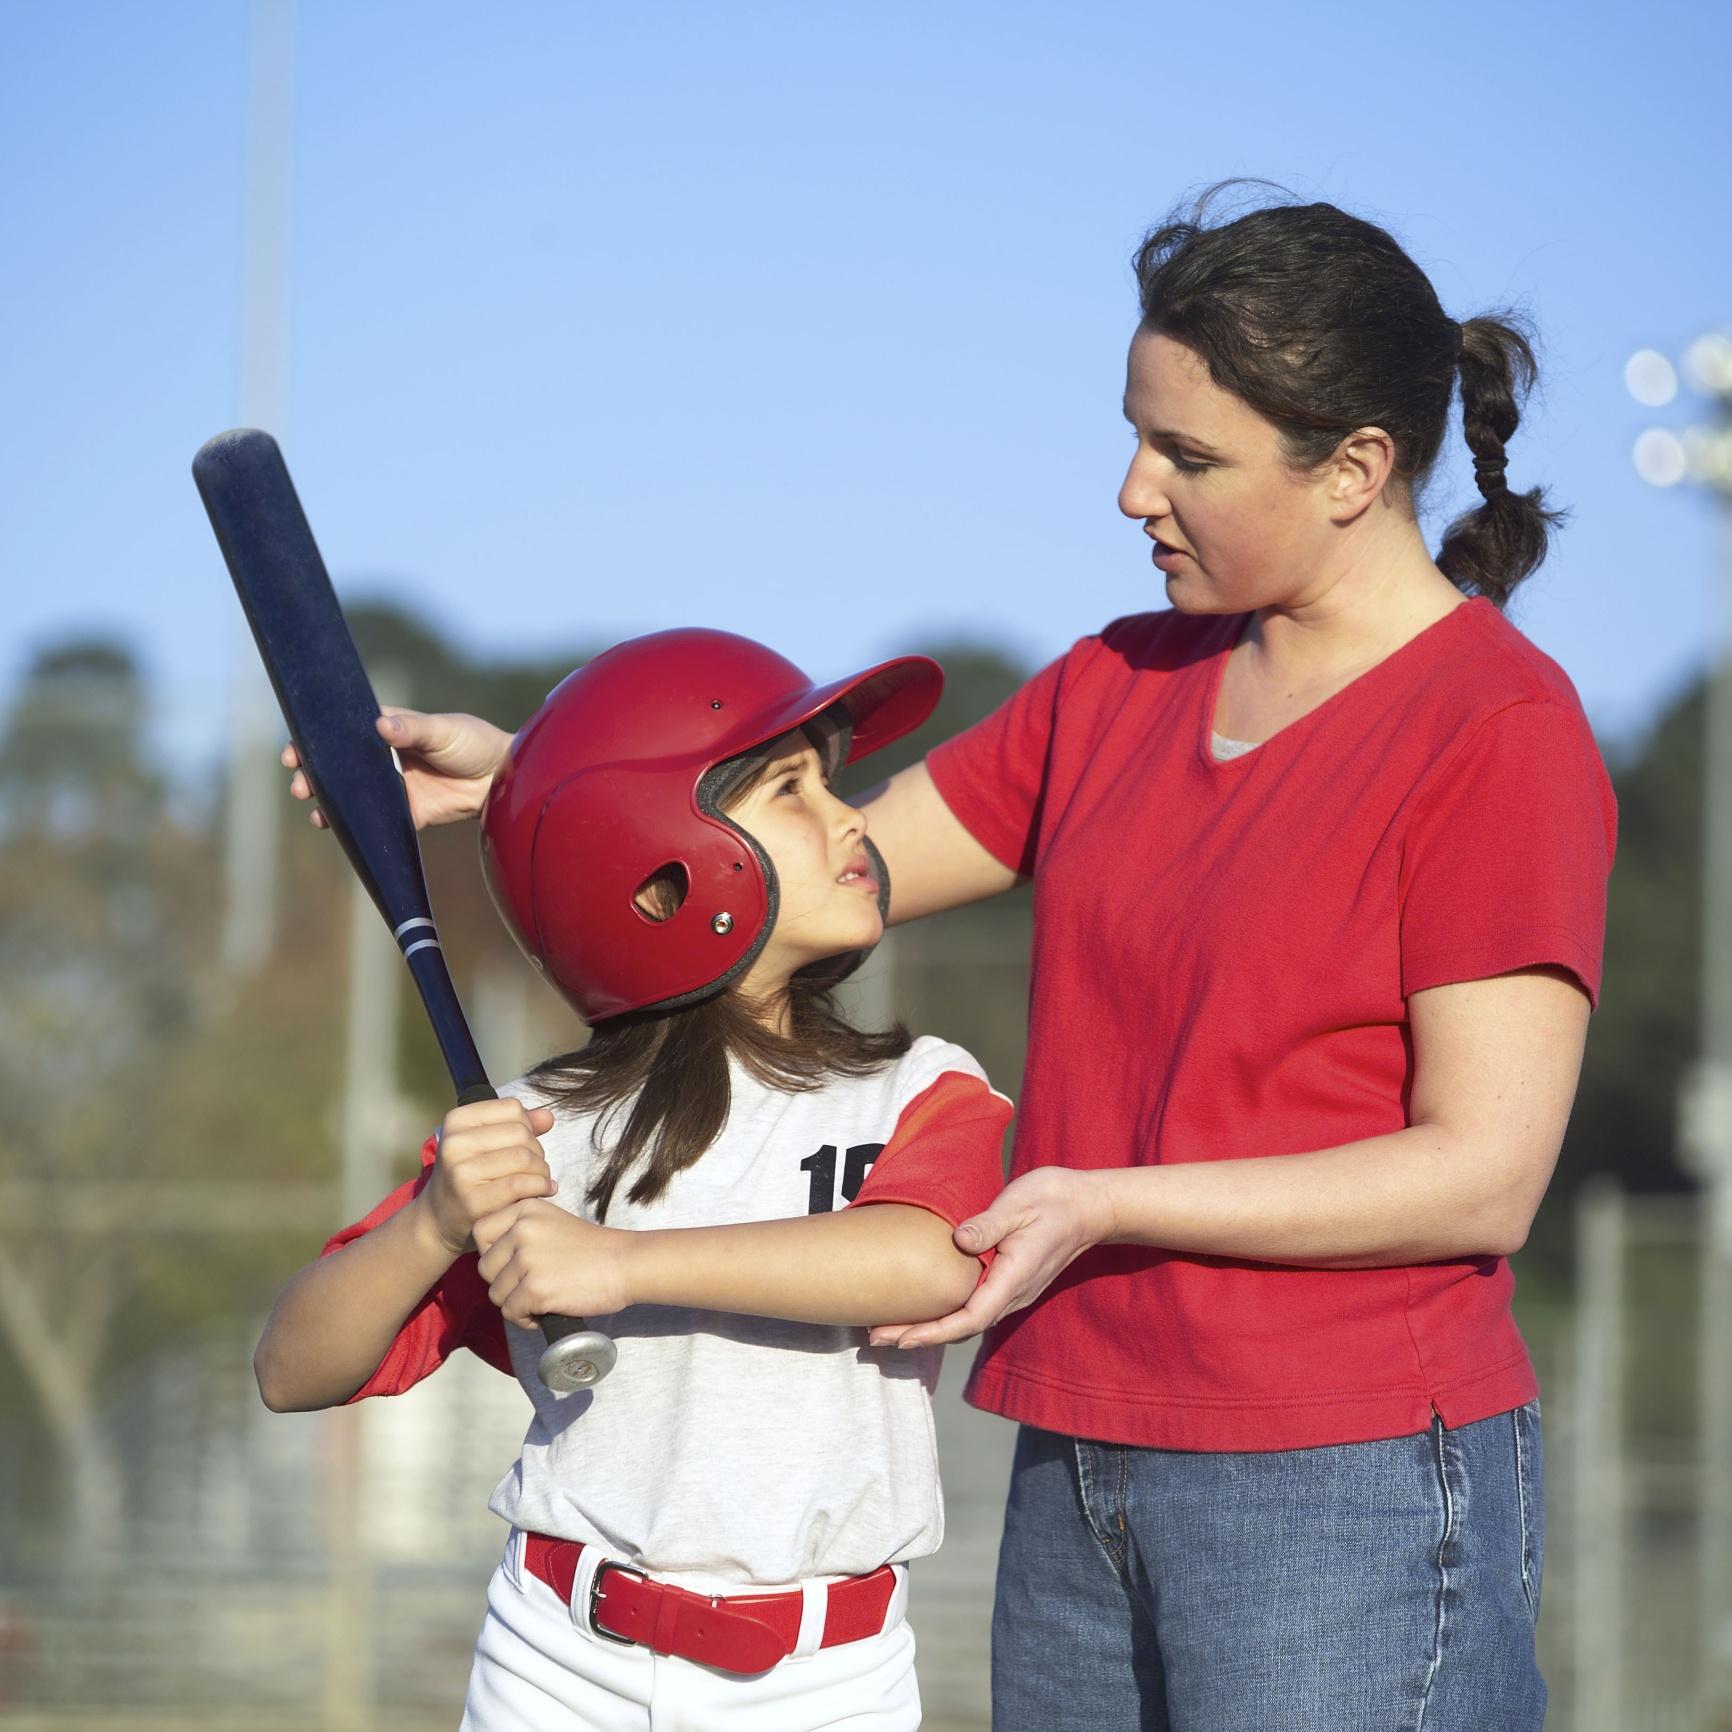 softball-coach-and-player.jpg